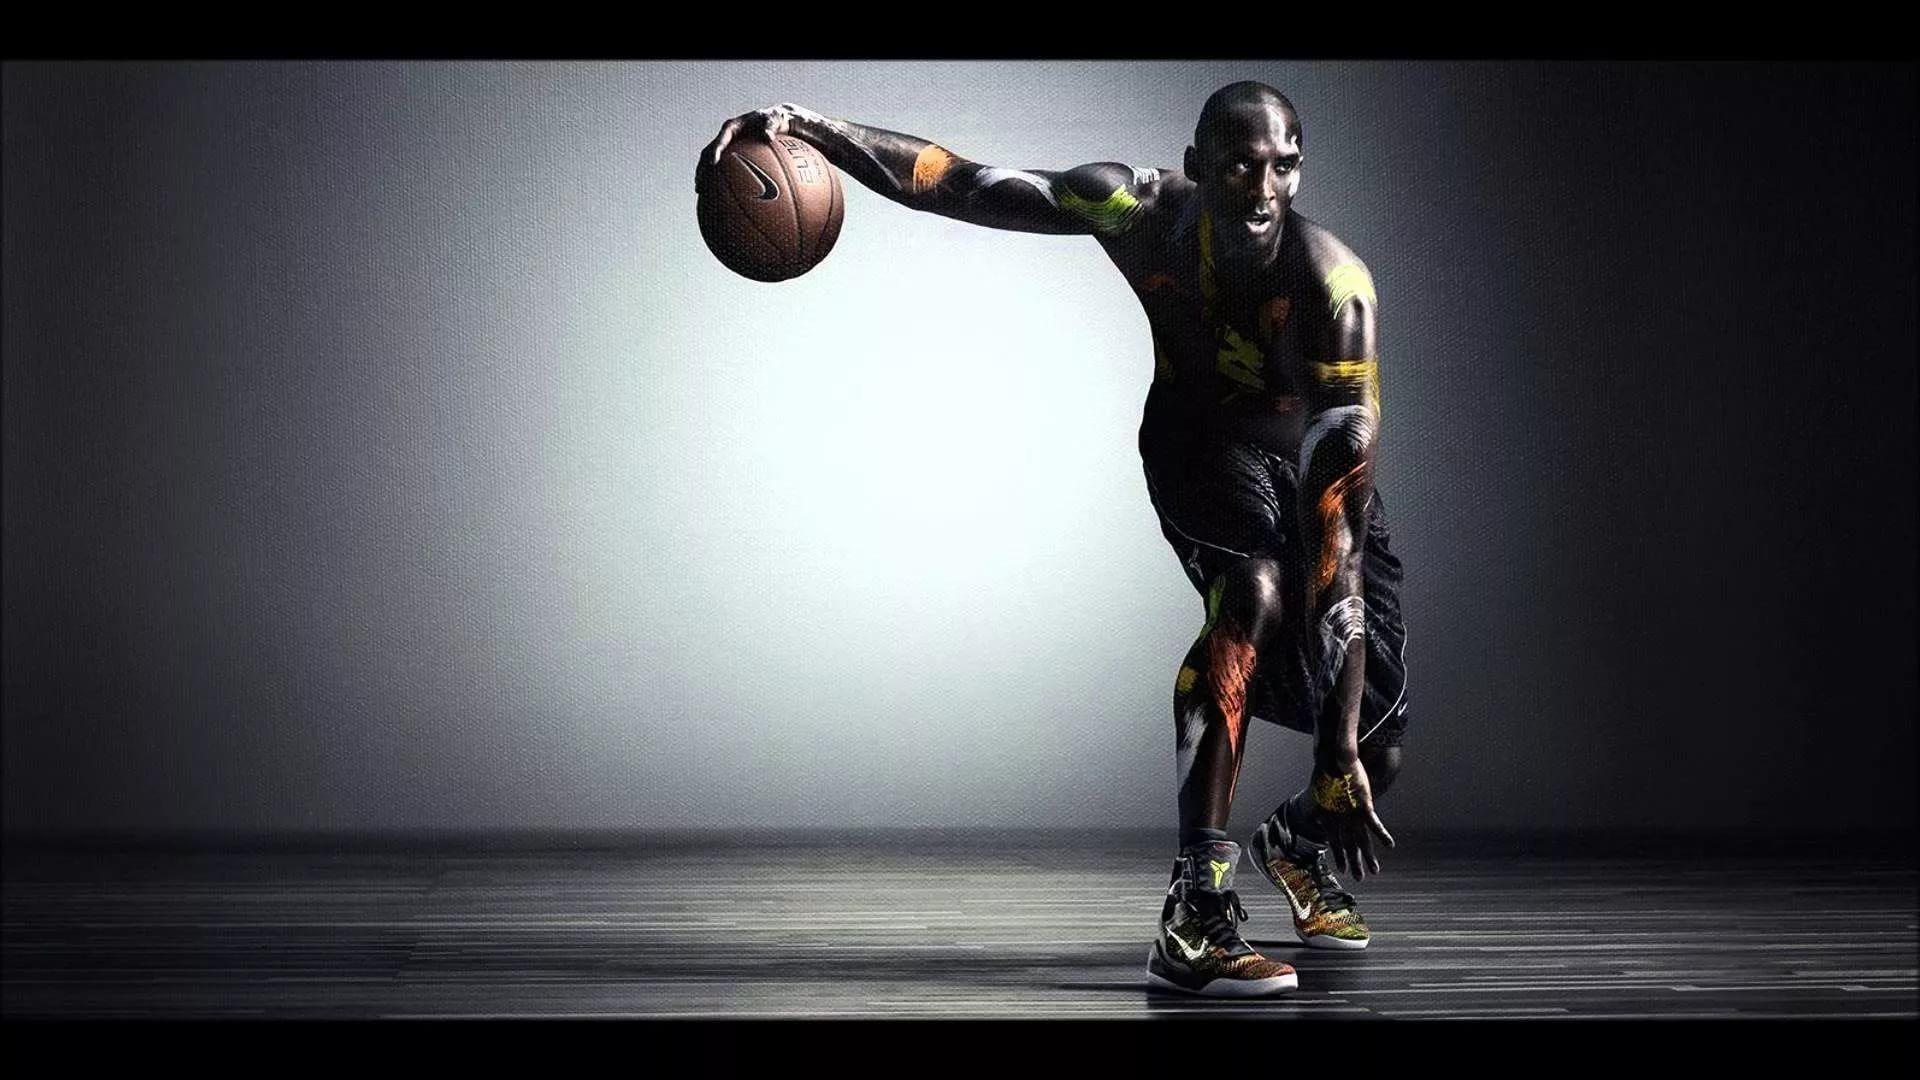 Nike Basketball hd wallpaper download